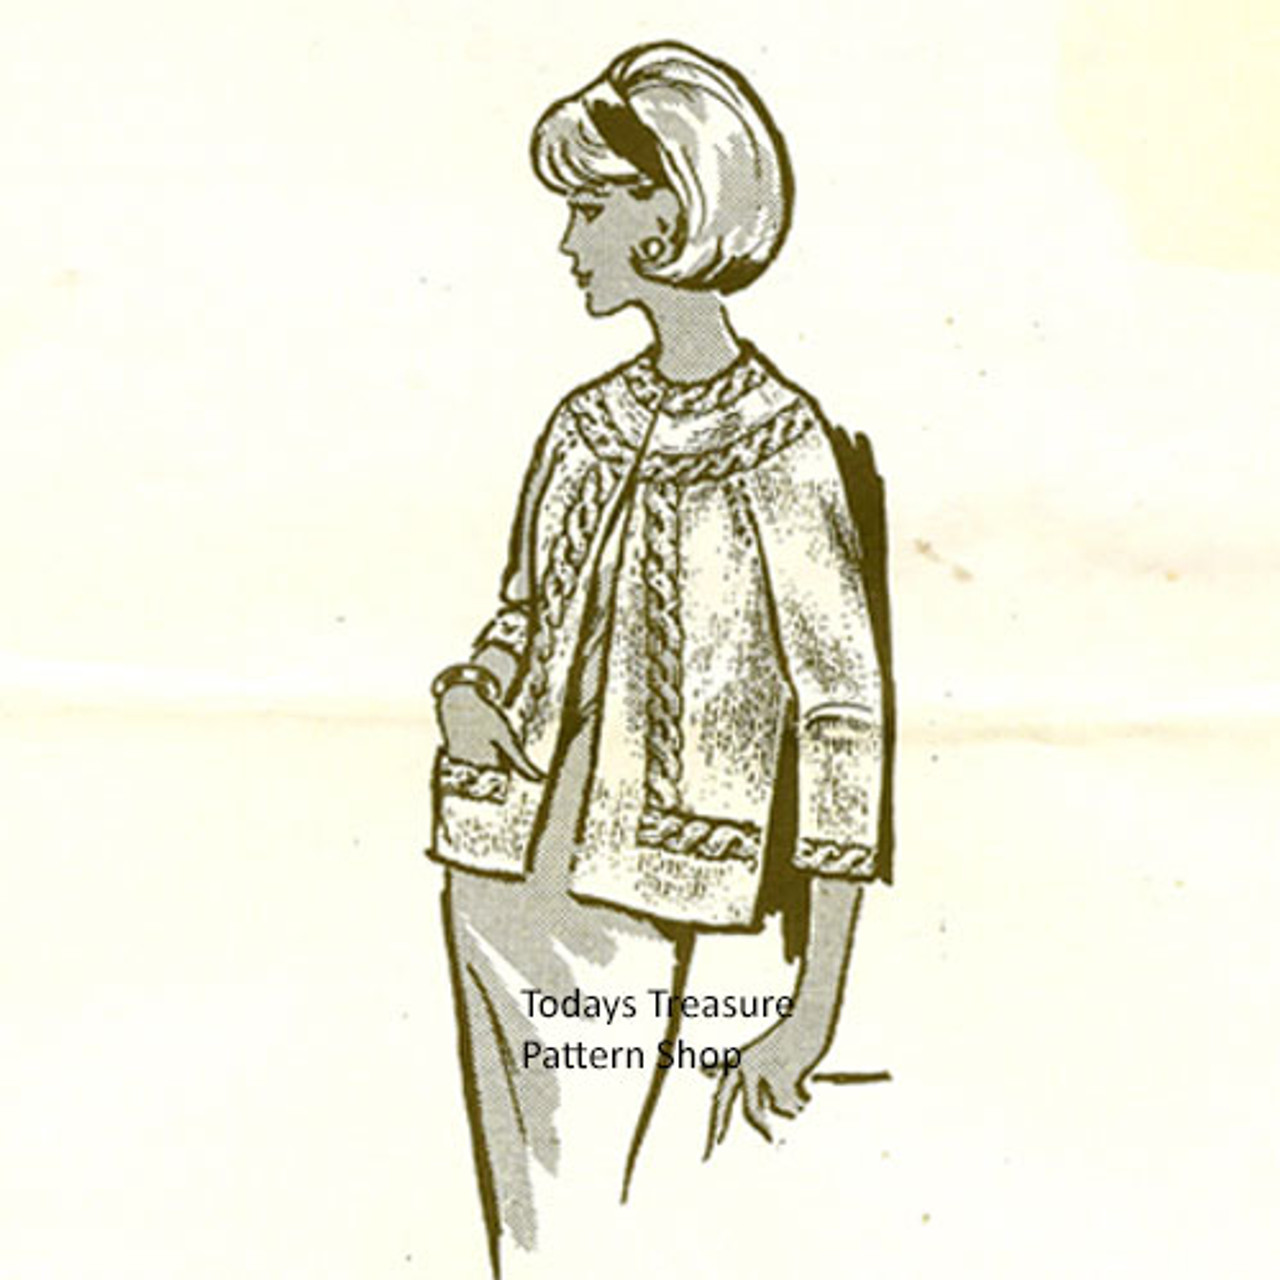 Cable Trimmed Jacket Knitting Pattern, Design 540